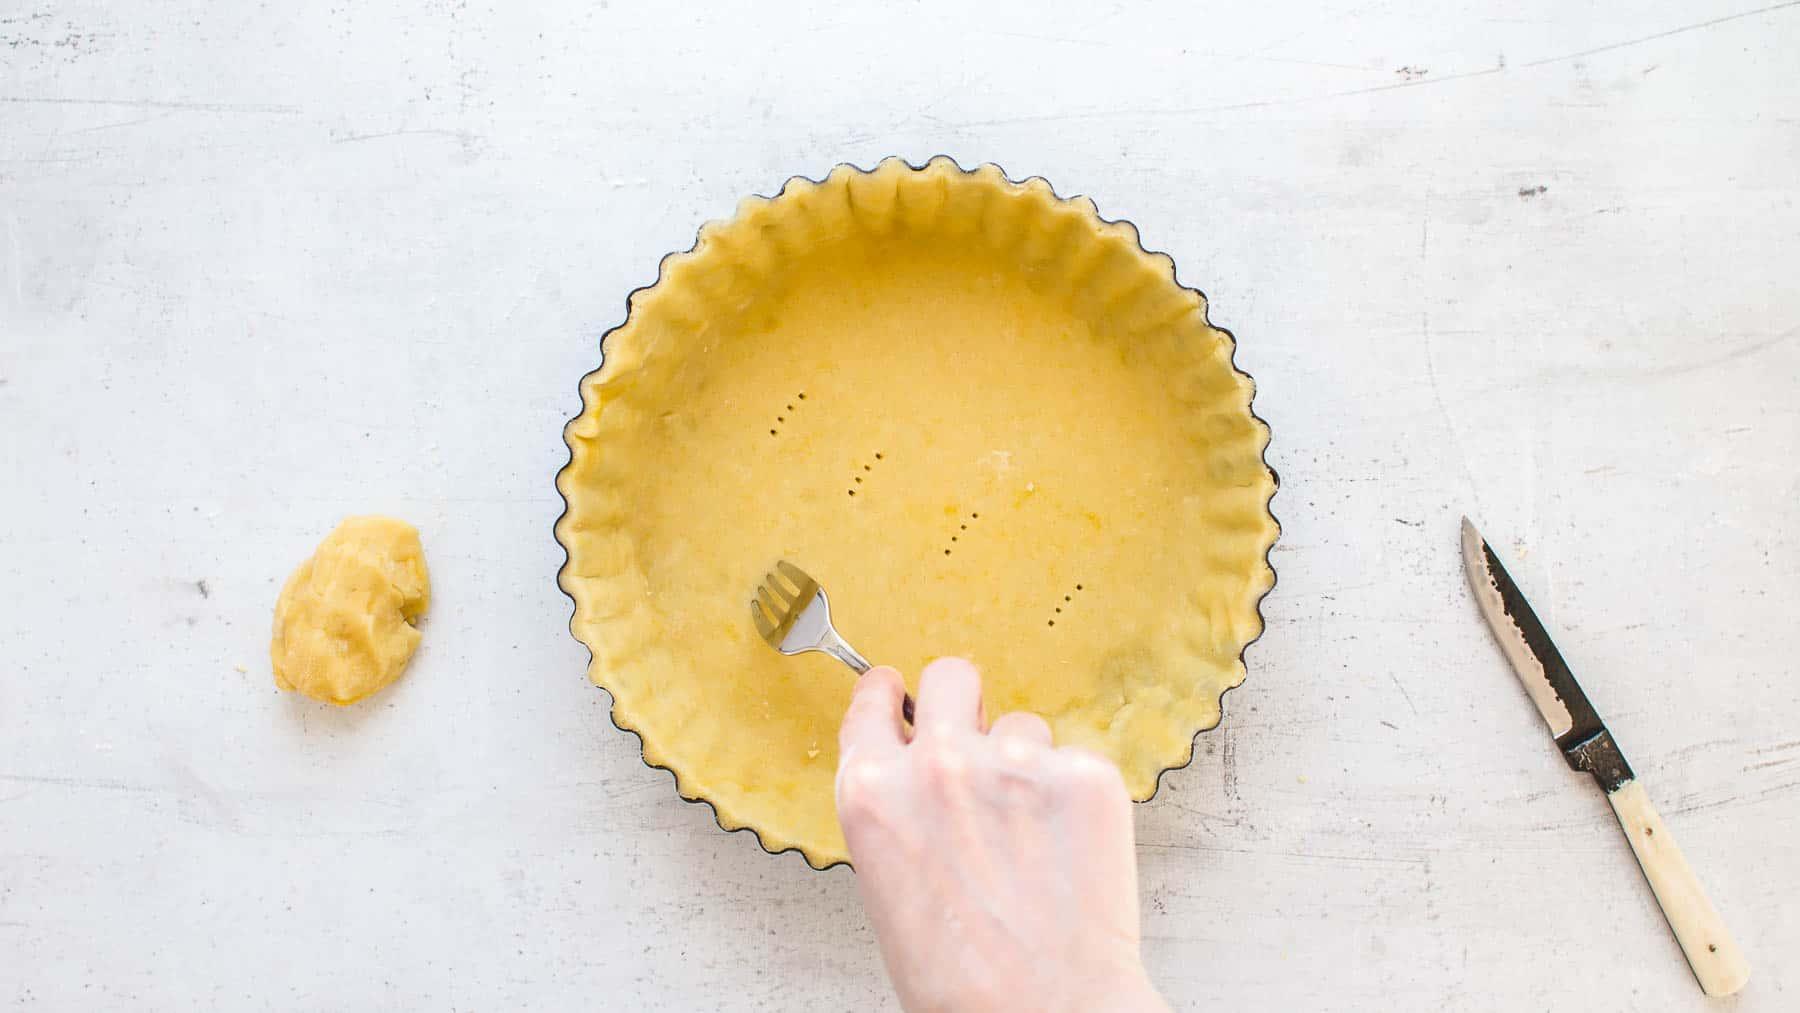 Peaking the bottom of the tart crust